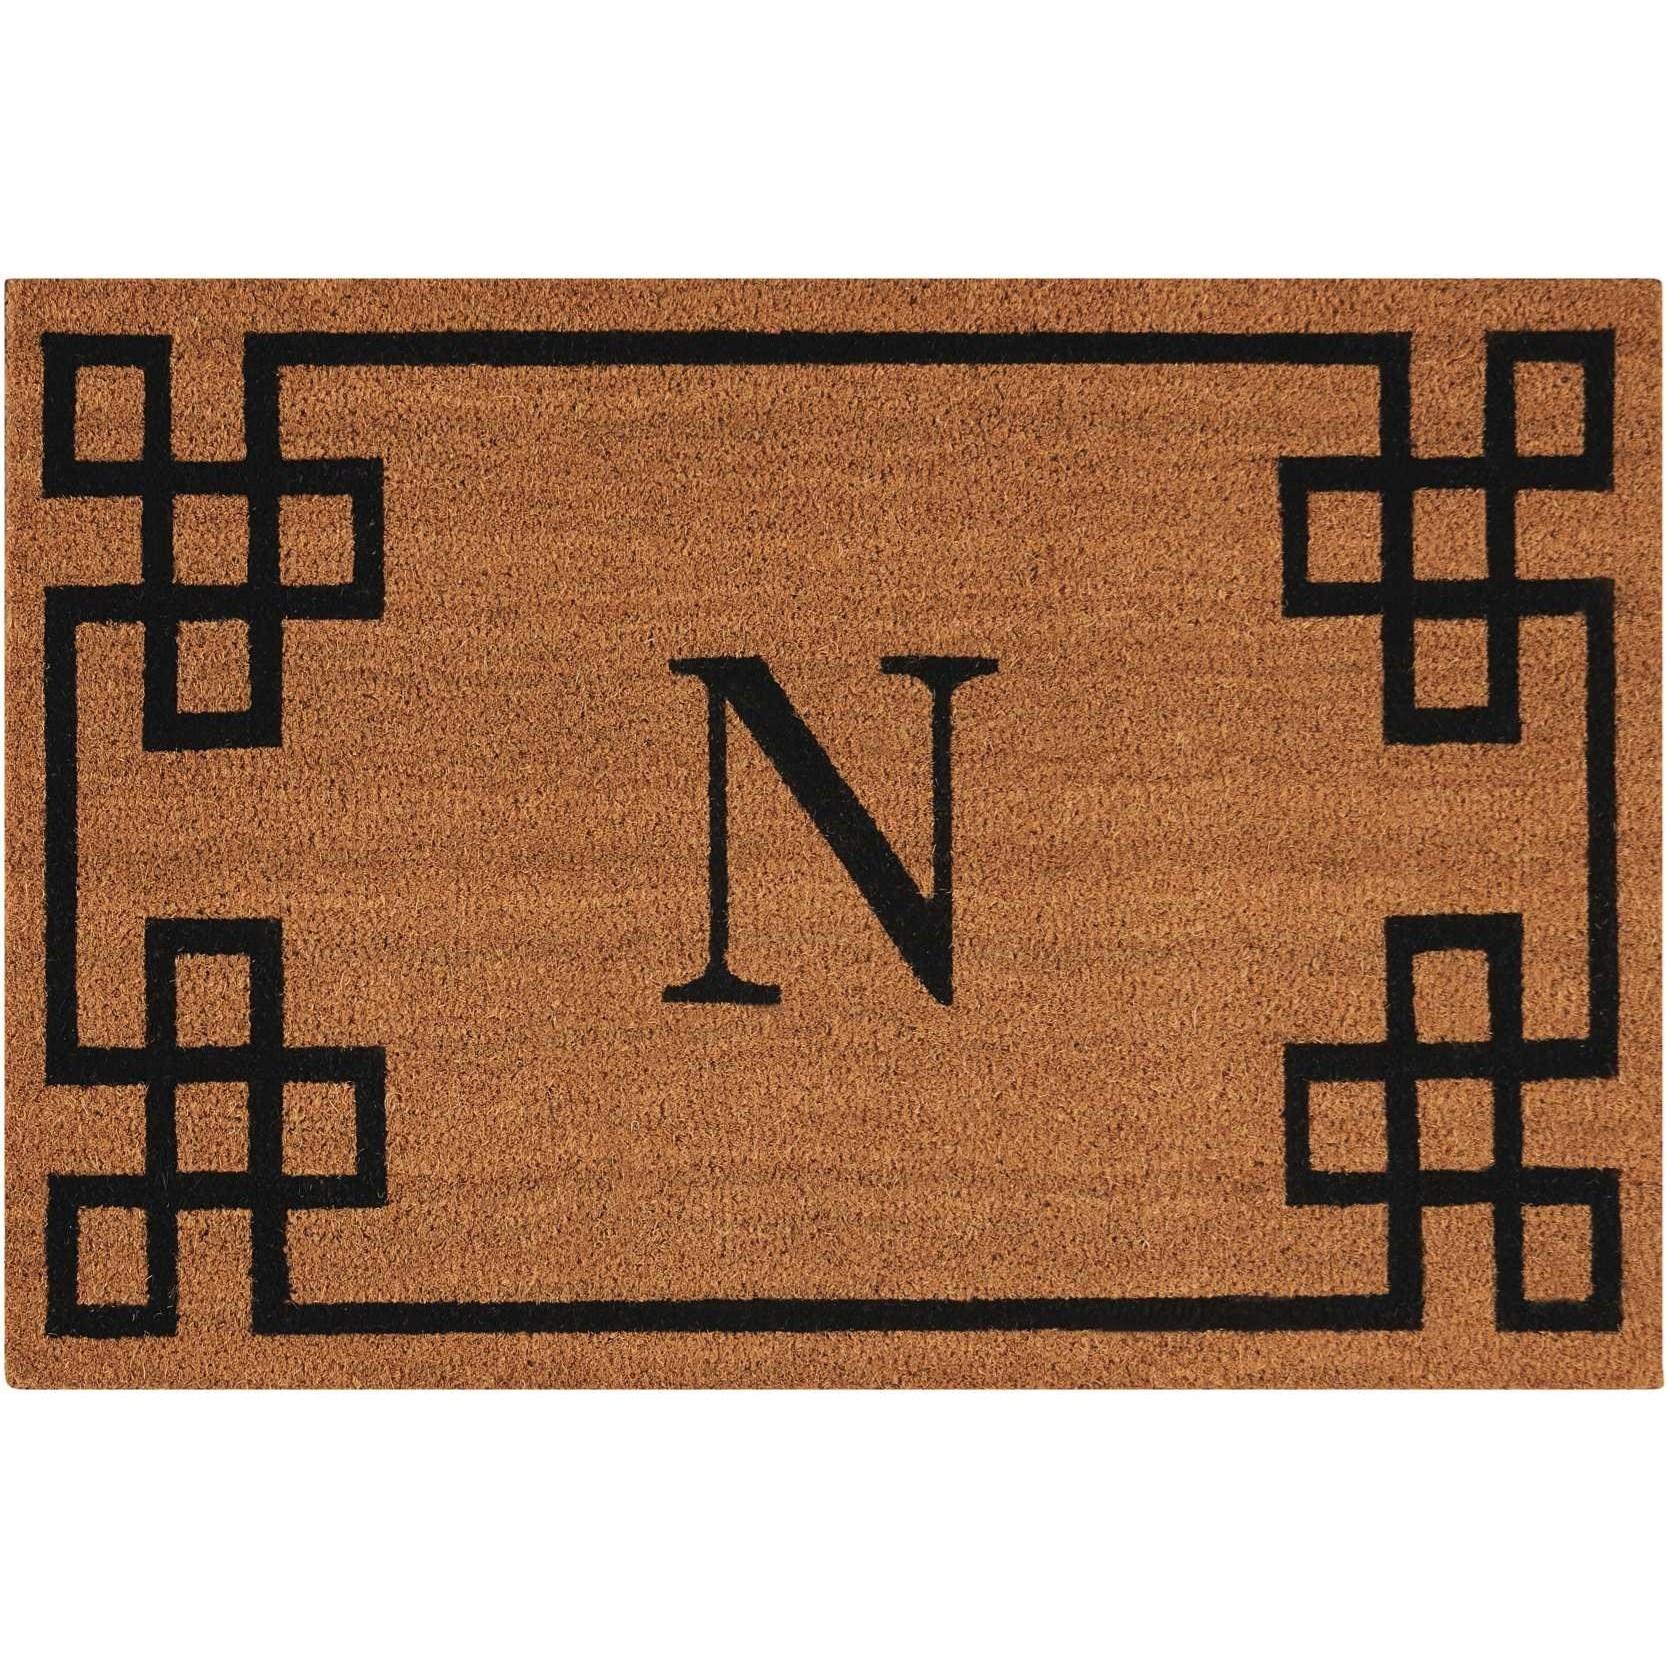 Elegant Entry 2' x 3' Natural Rectangle Rug by Nourison at Sprintz Furniture